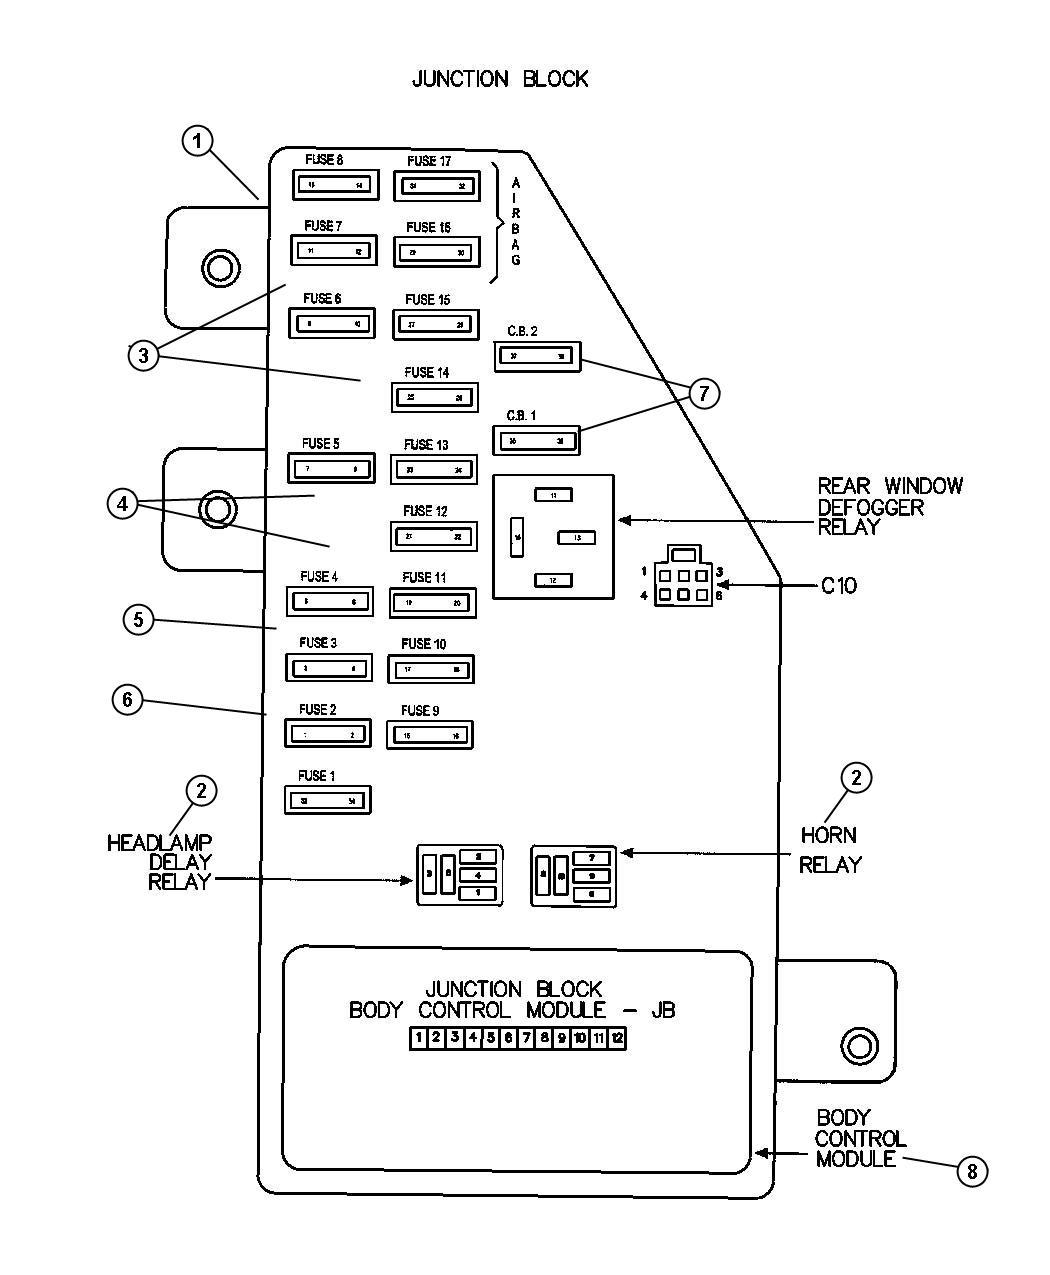 2003 dodge ram 1500 power window wiring diagram mini usb car charger 2001 fuse box stratus schema2001 intrepid location manual e books